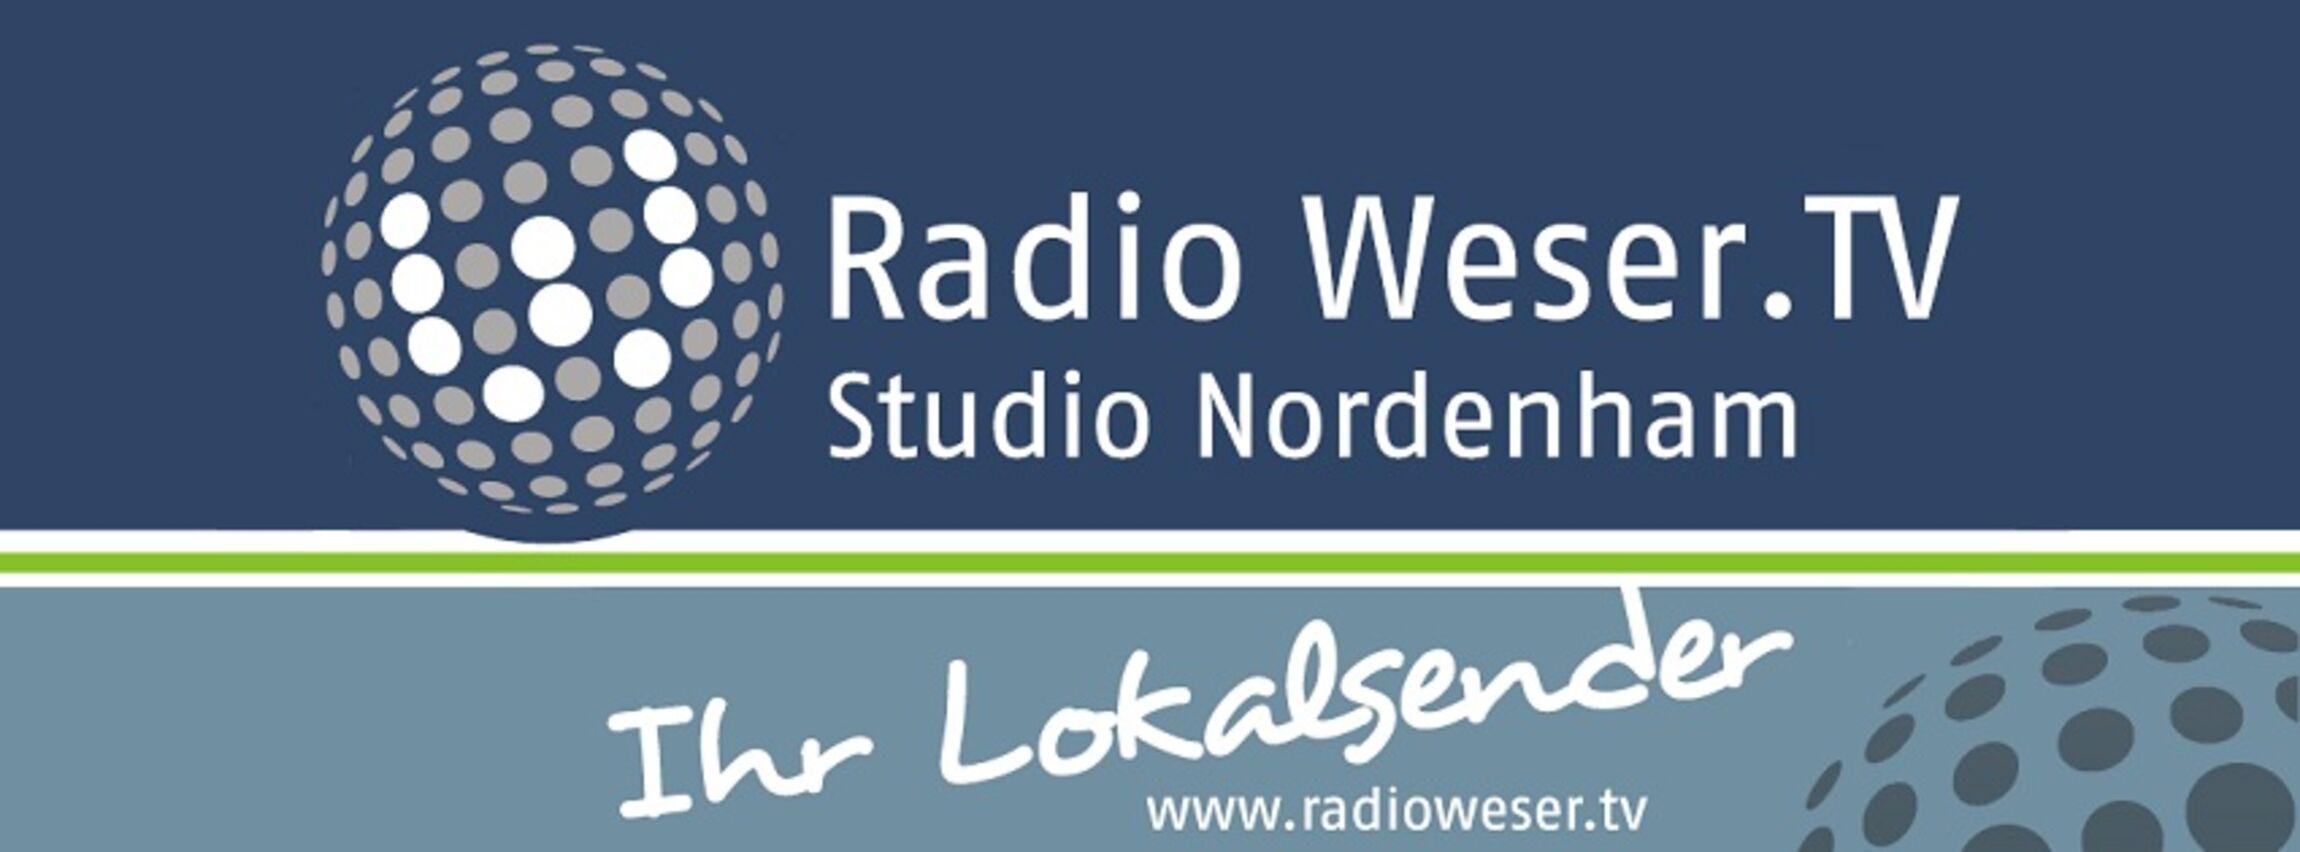 Radio WeserTV